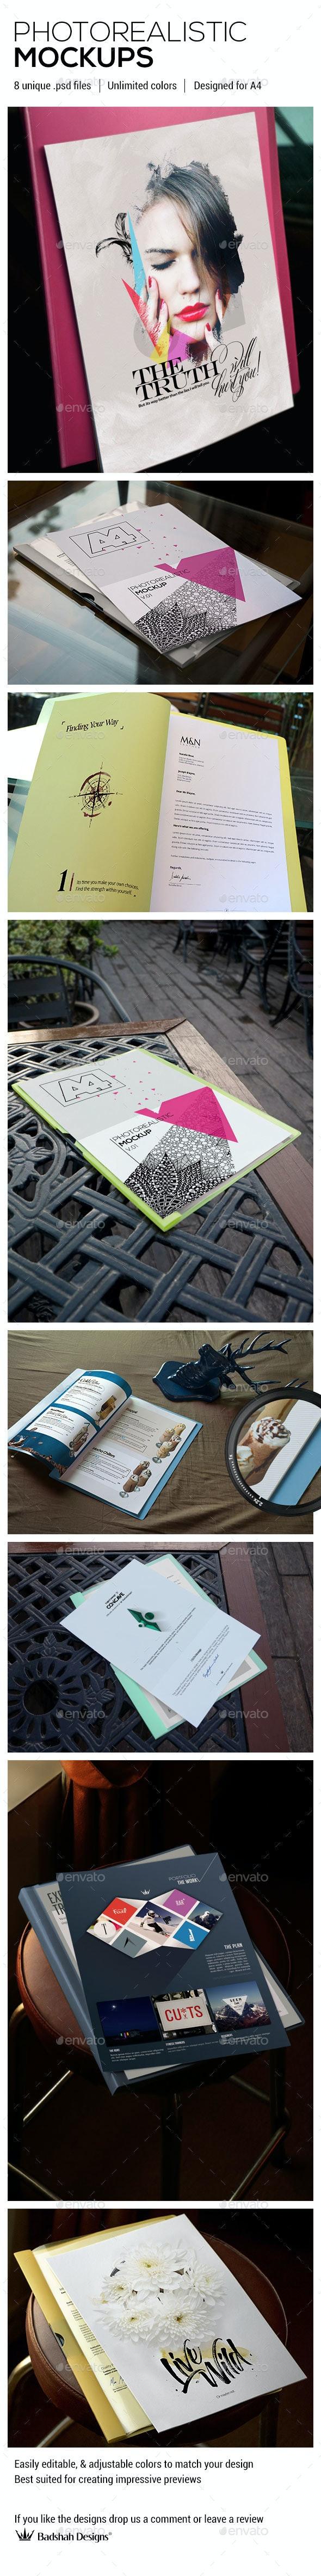 A4 Photorealistic Mockups - Print Product Mock-Ups